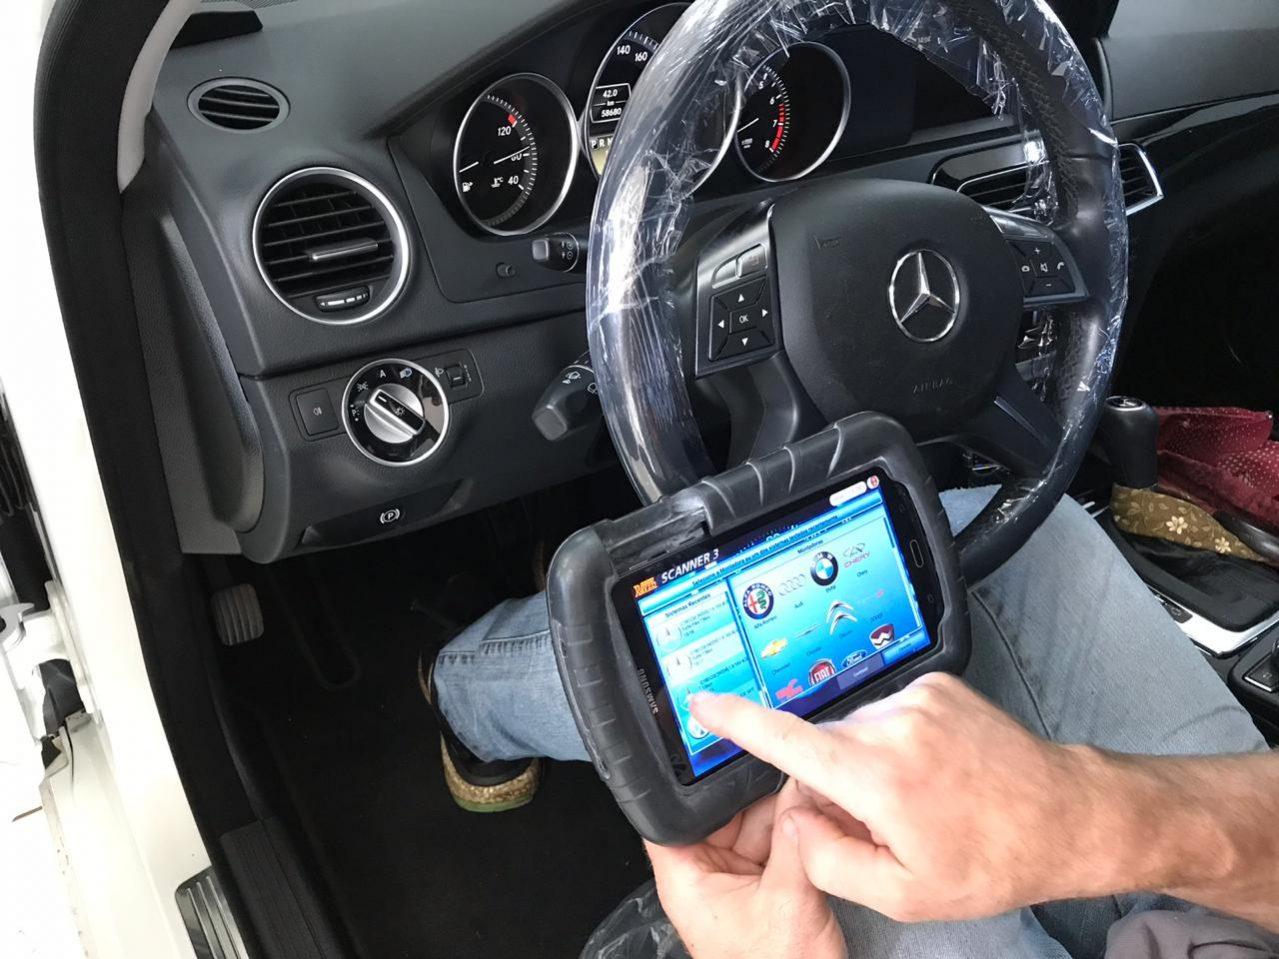 Talento-automotivo-cascavel-pr-mercedes-benz-c180-interior